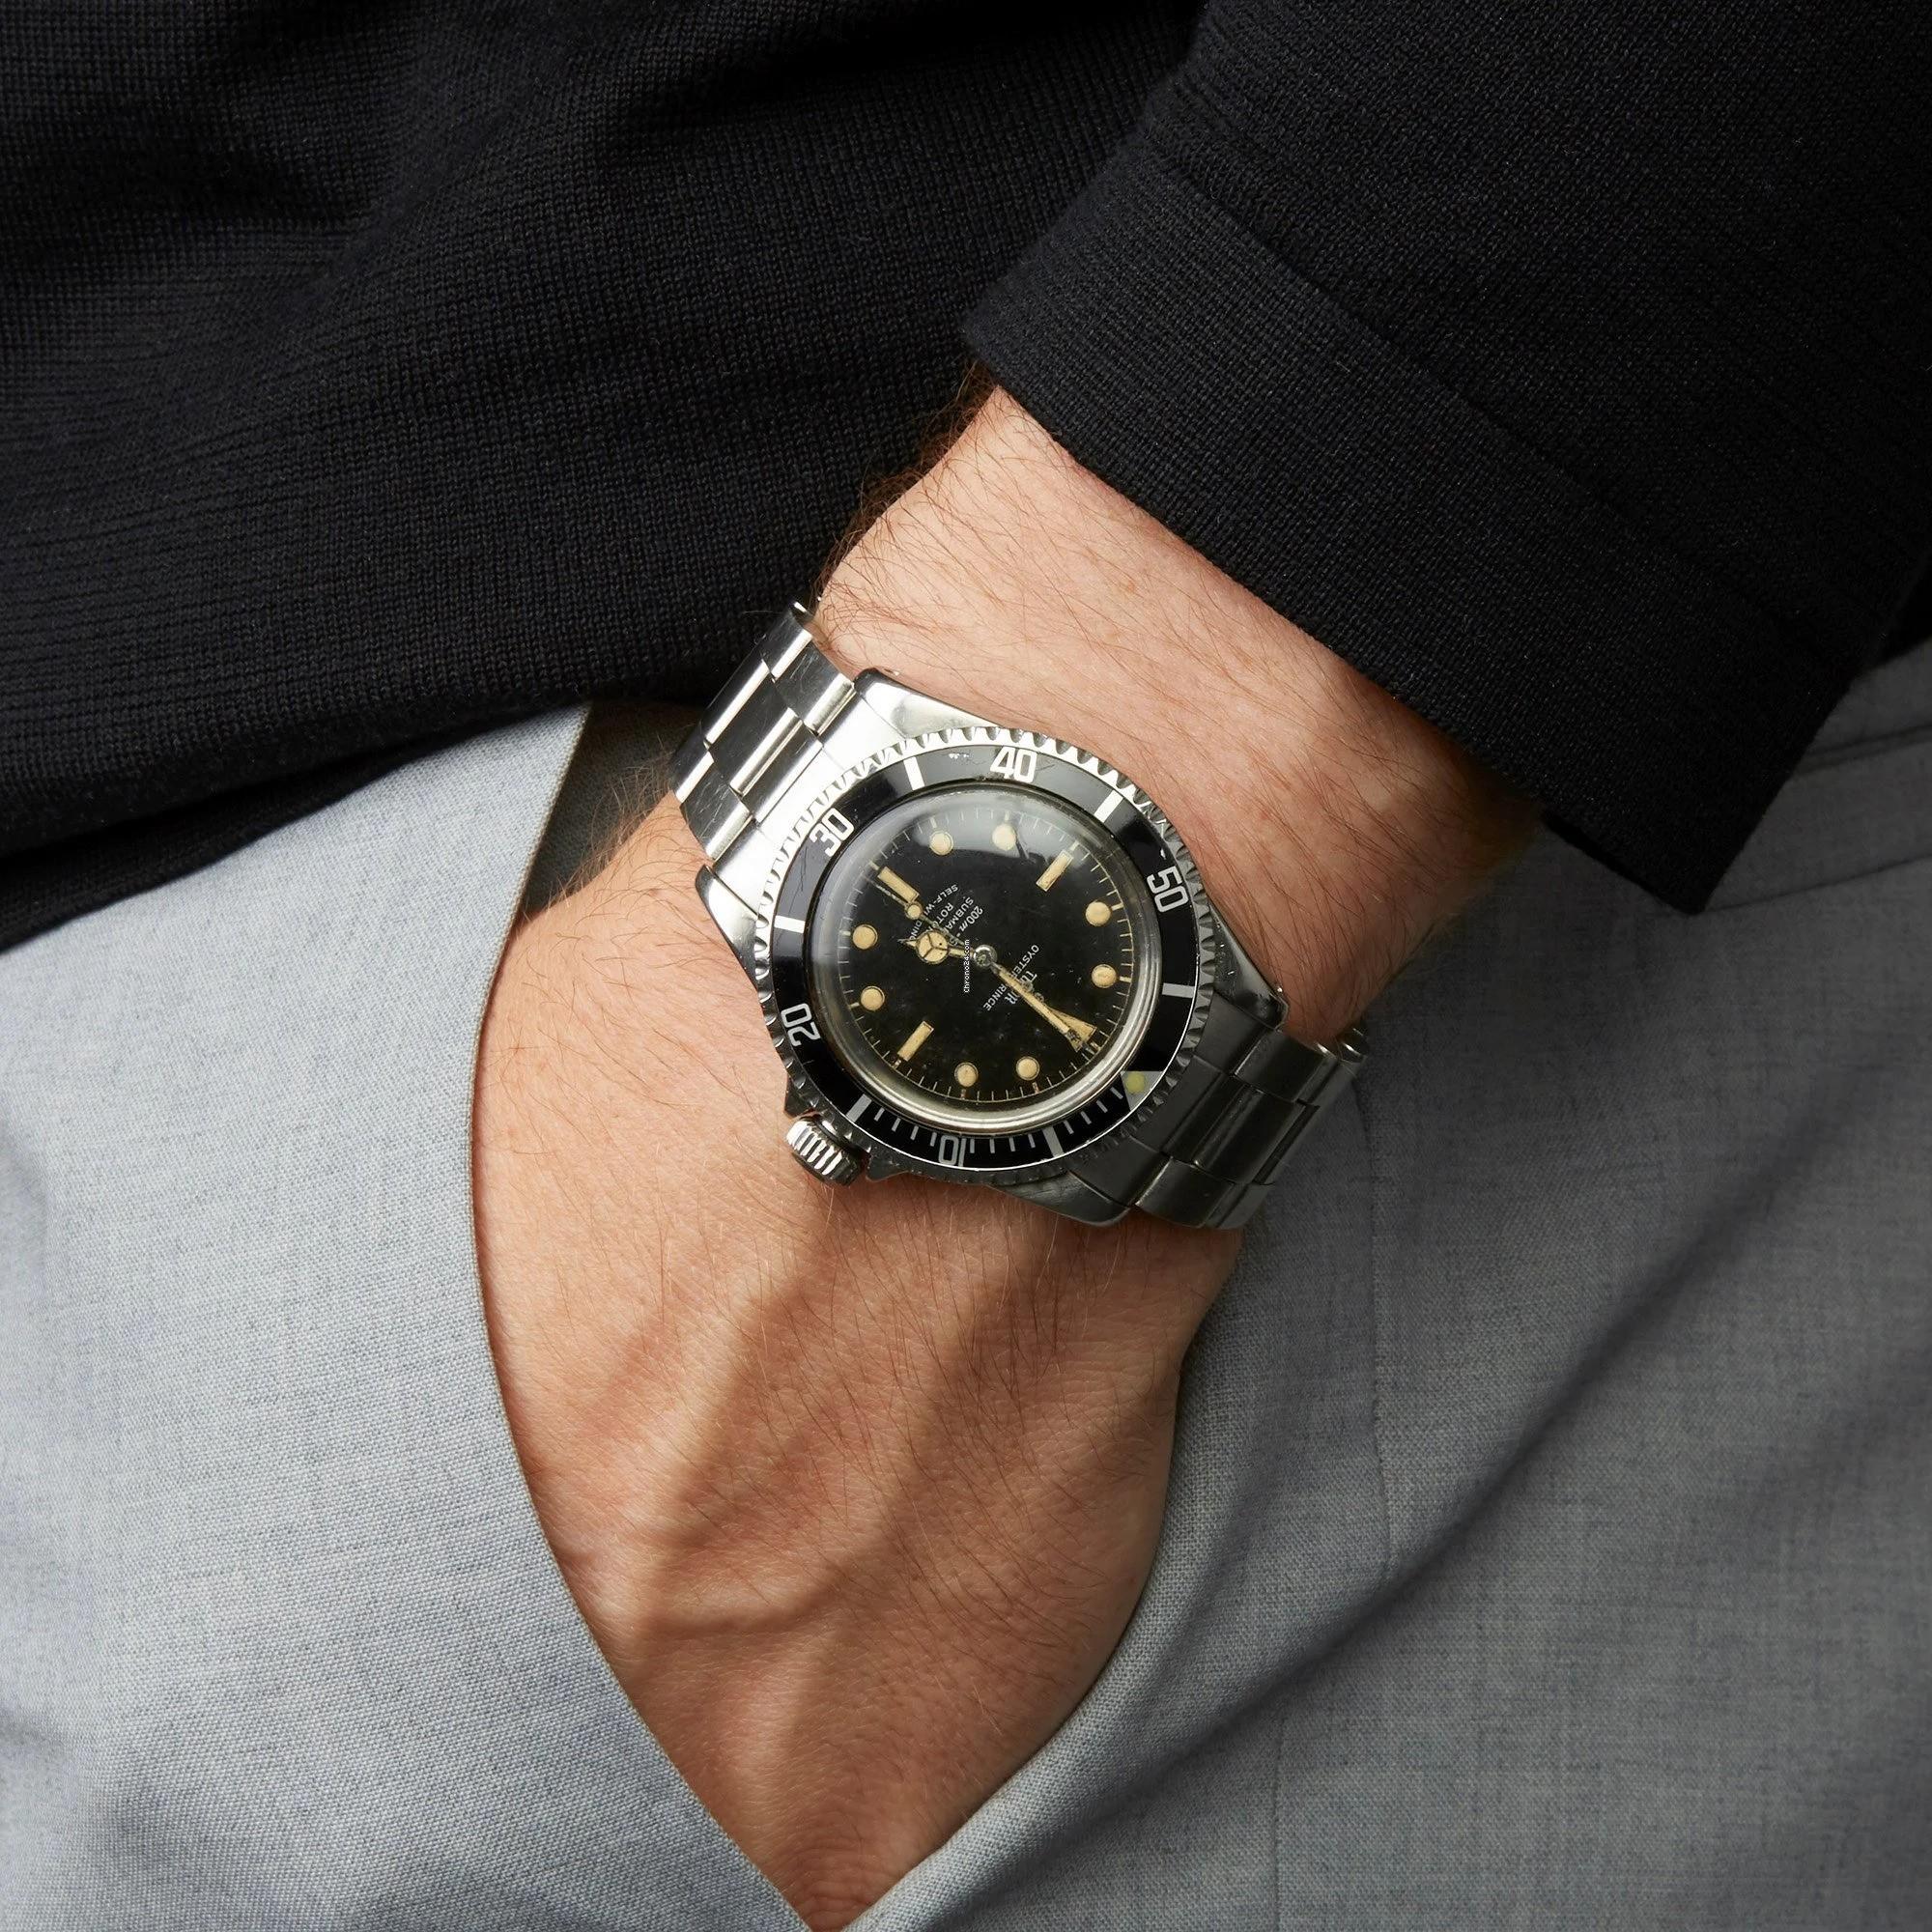 Мужские часы Tudor Submariner Pointed Guards Vintage Steel 7928